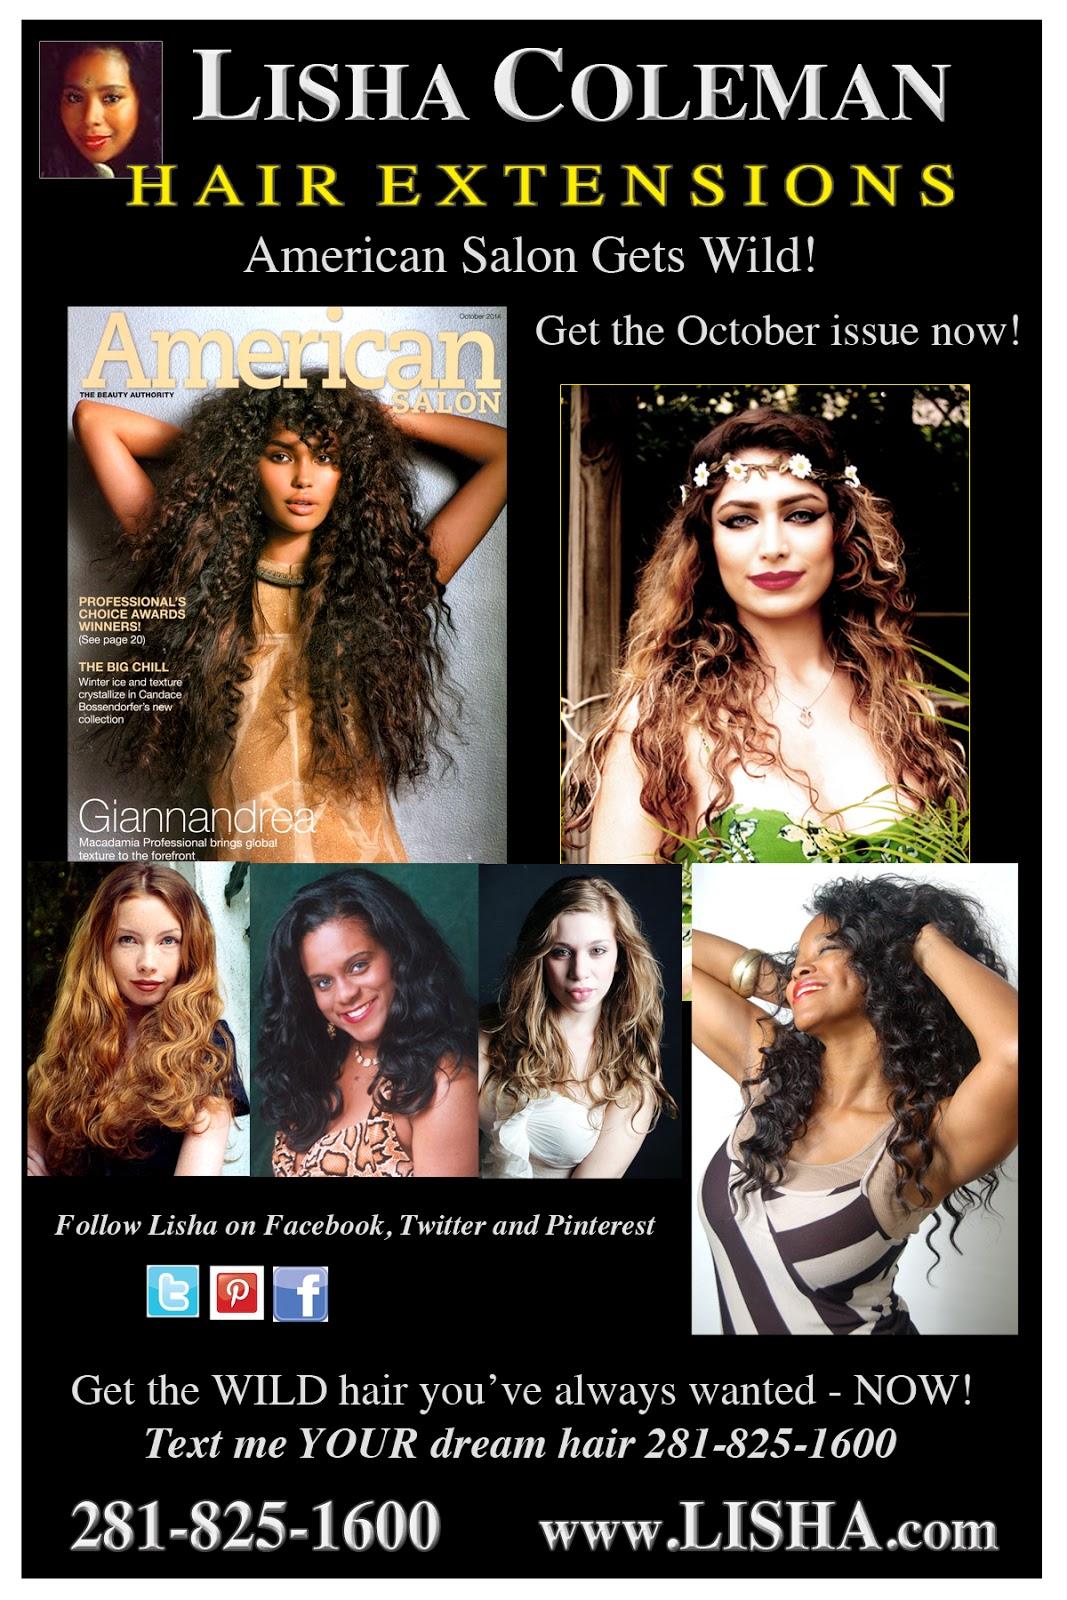 Hair Extensions Houston 281 825 1600 Lisha